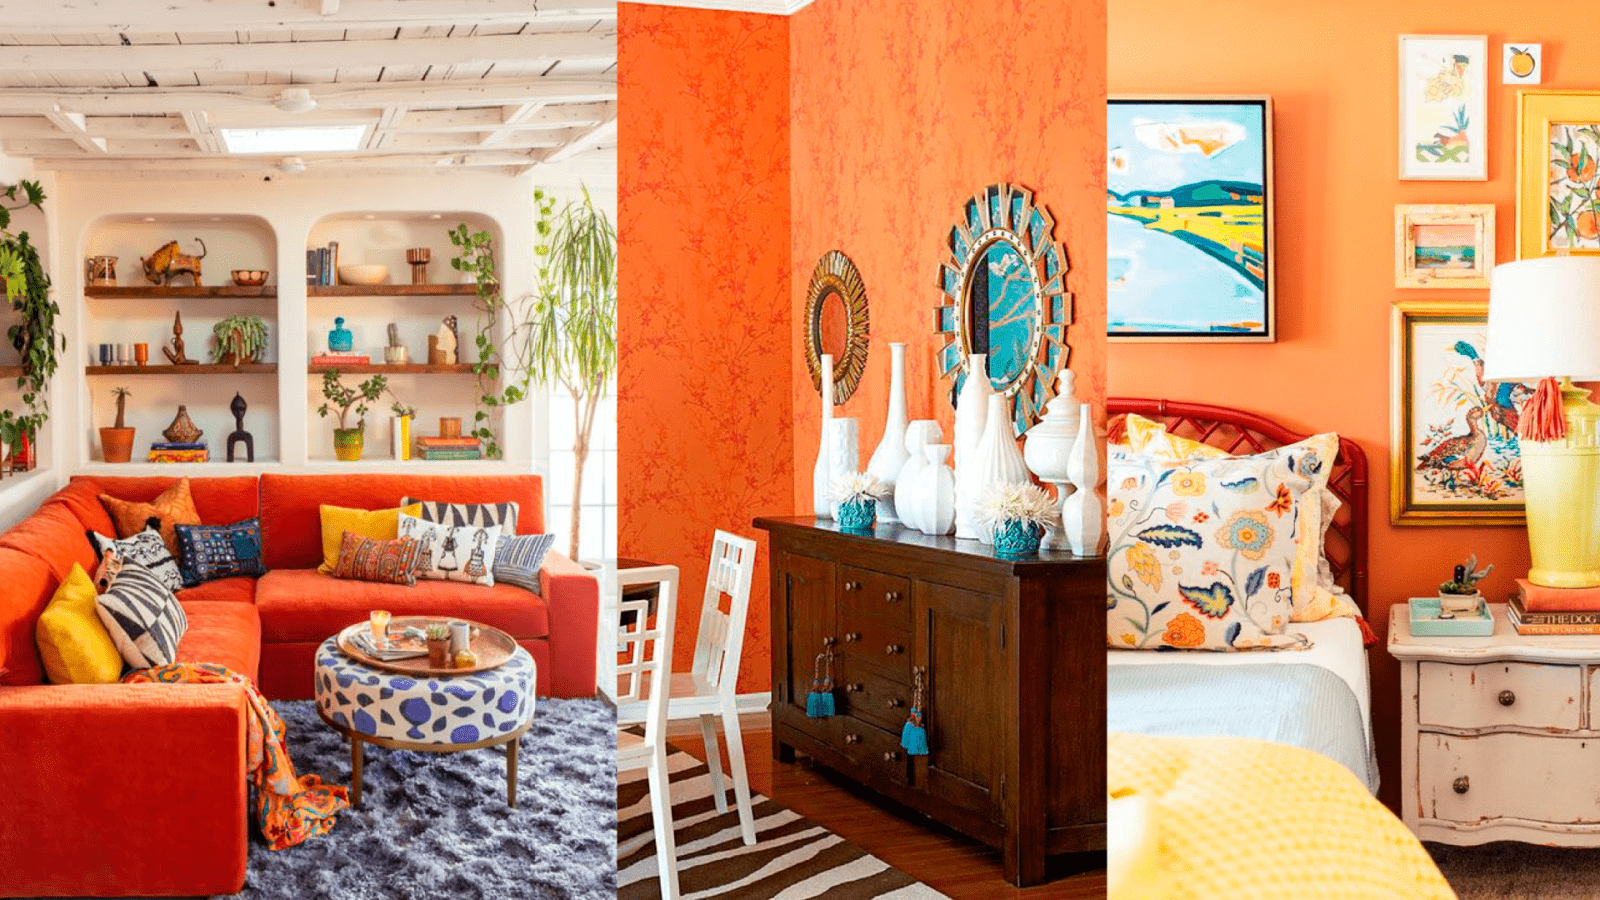 casa com decoracao laranja